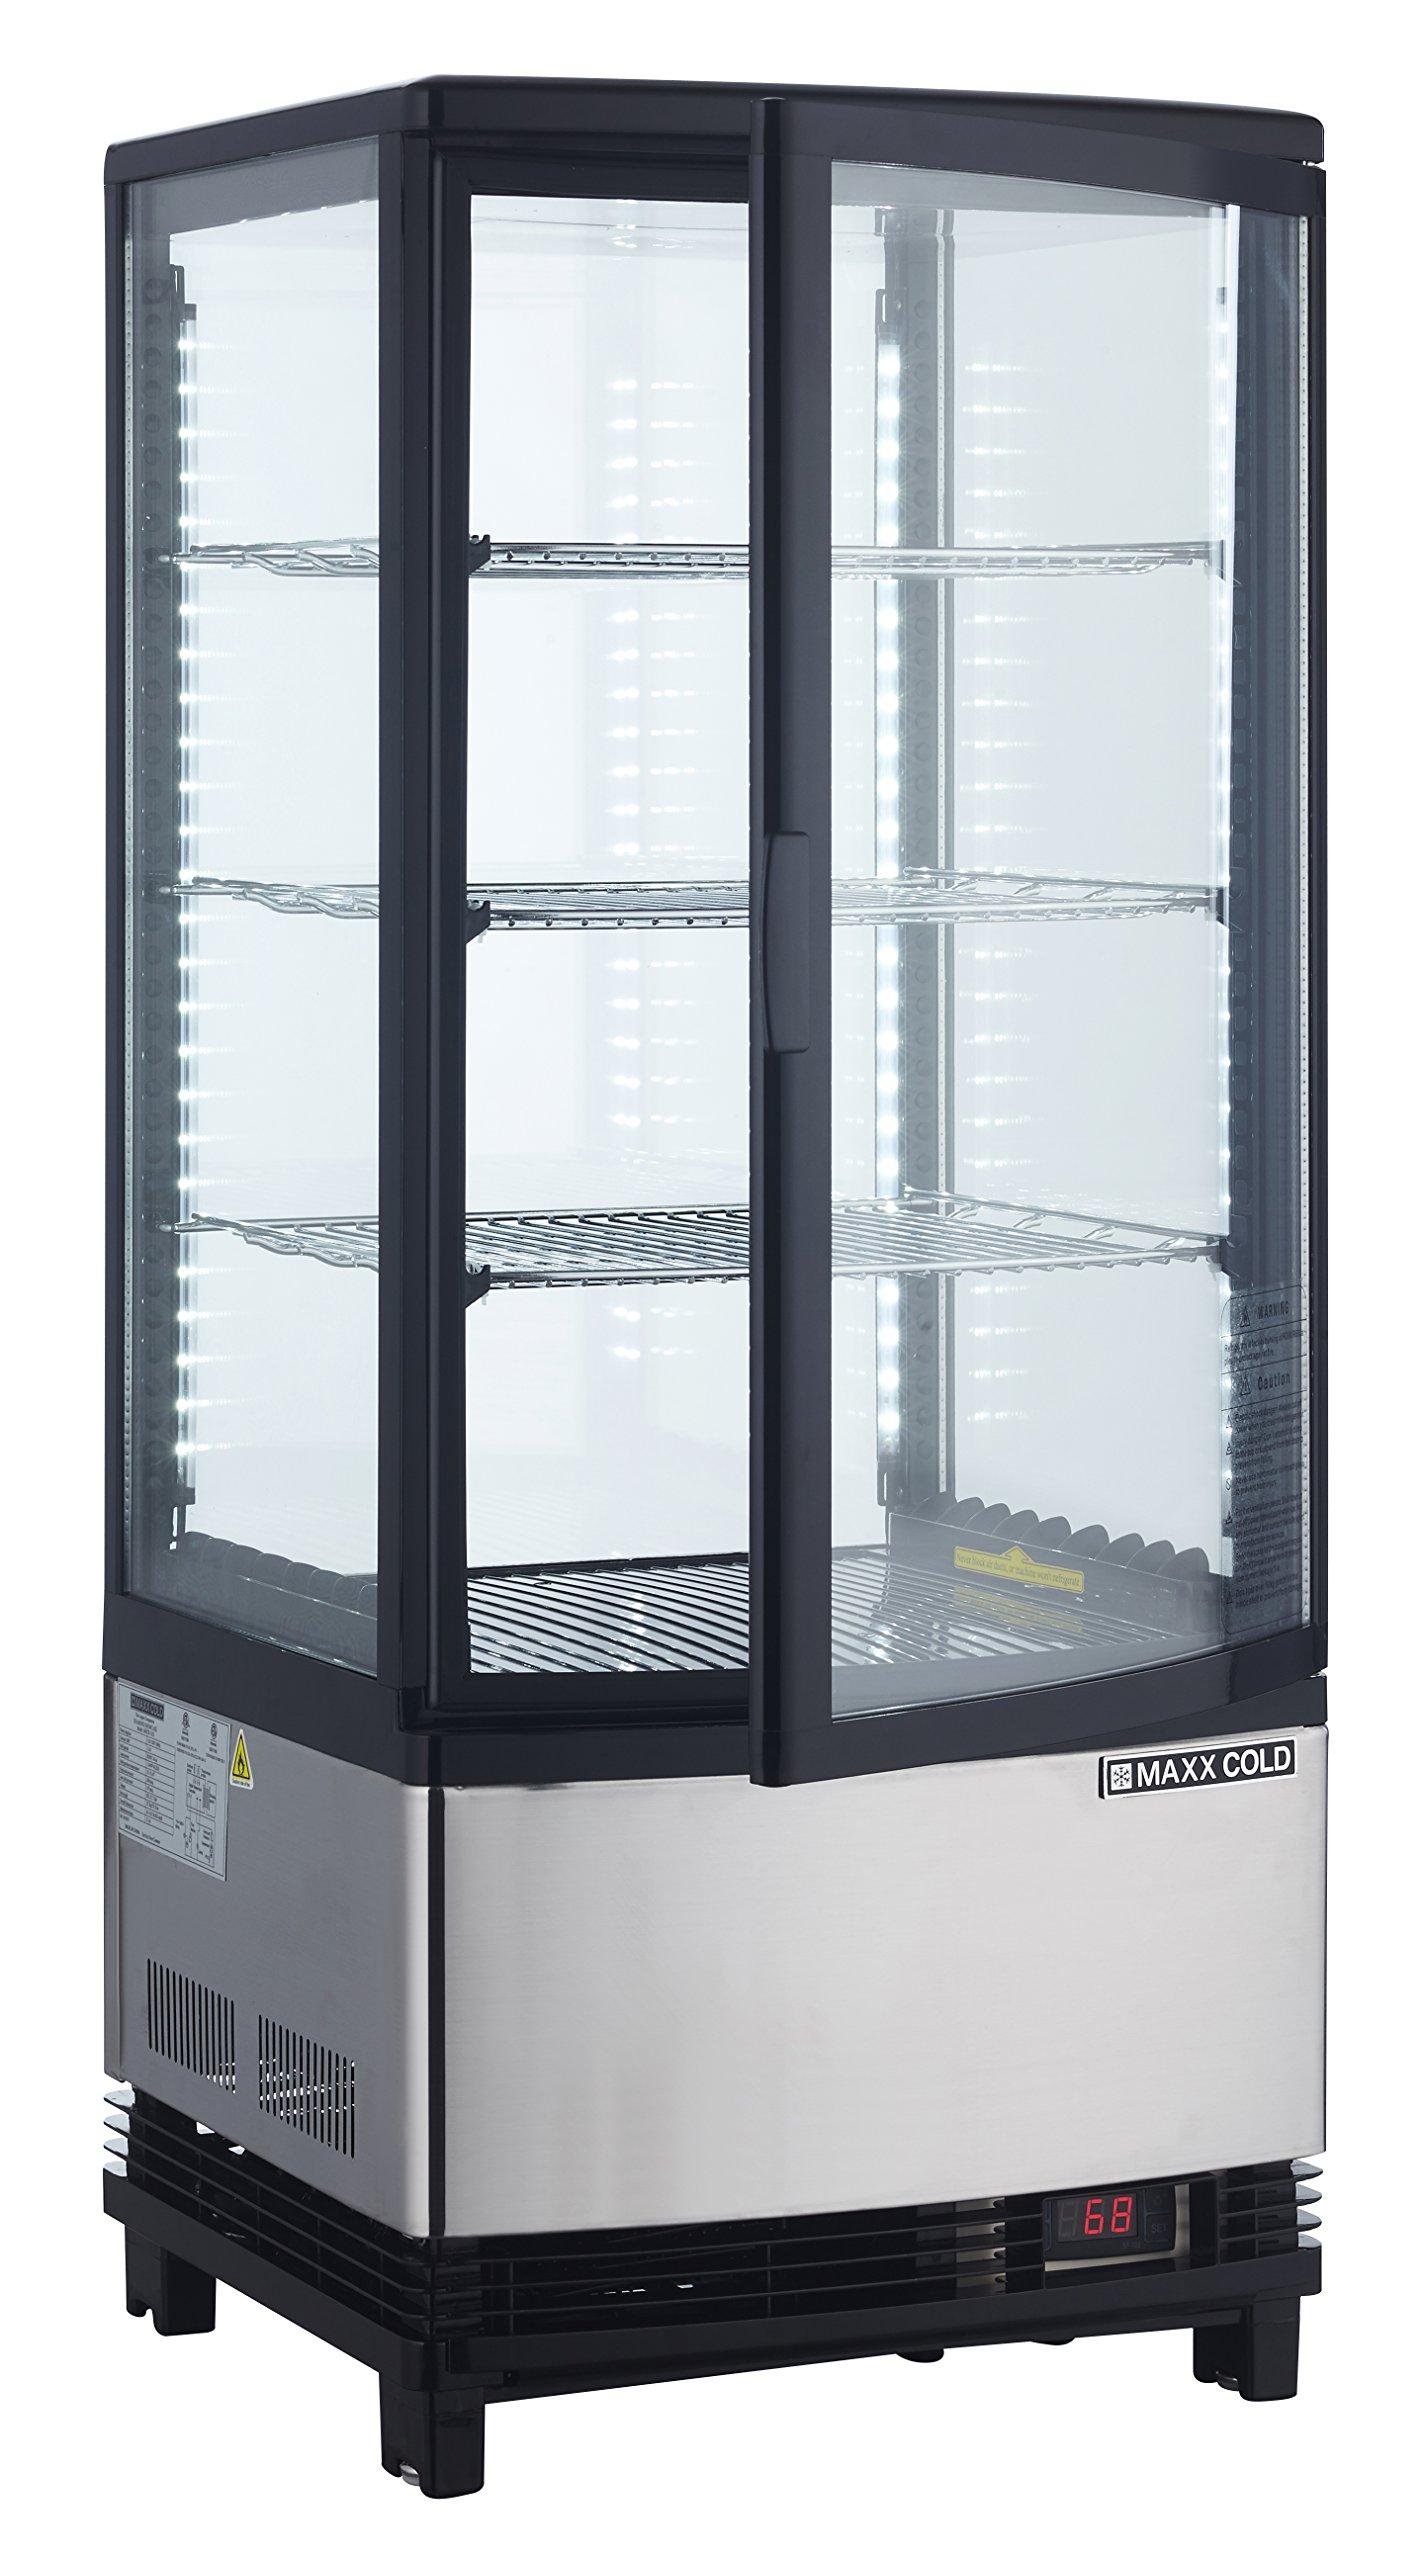 Maxx Cold MECR-31D Countertop 3 cu. ft. 1 Door LED Lighted Display Refrigerator Merchandiser